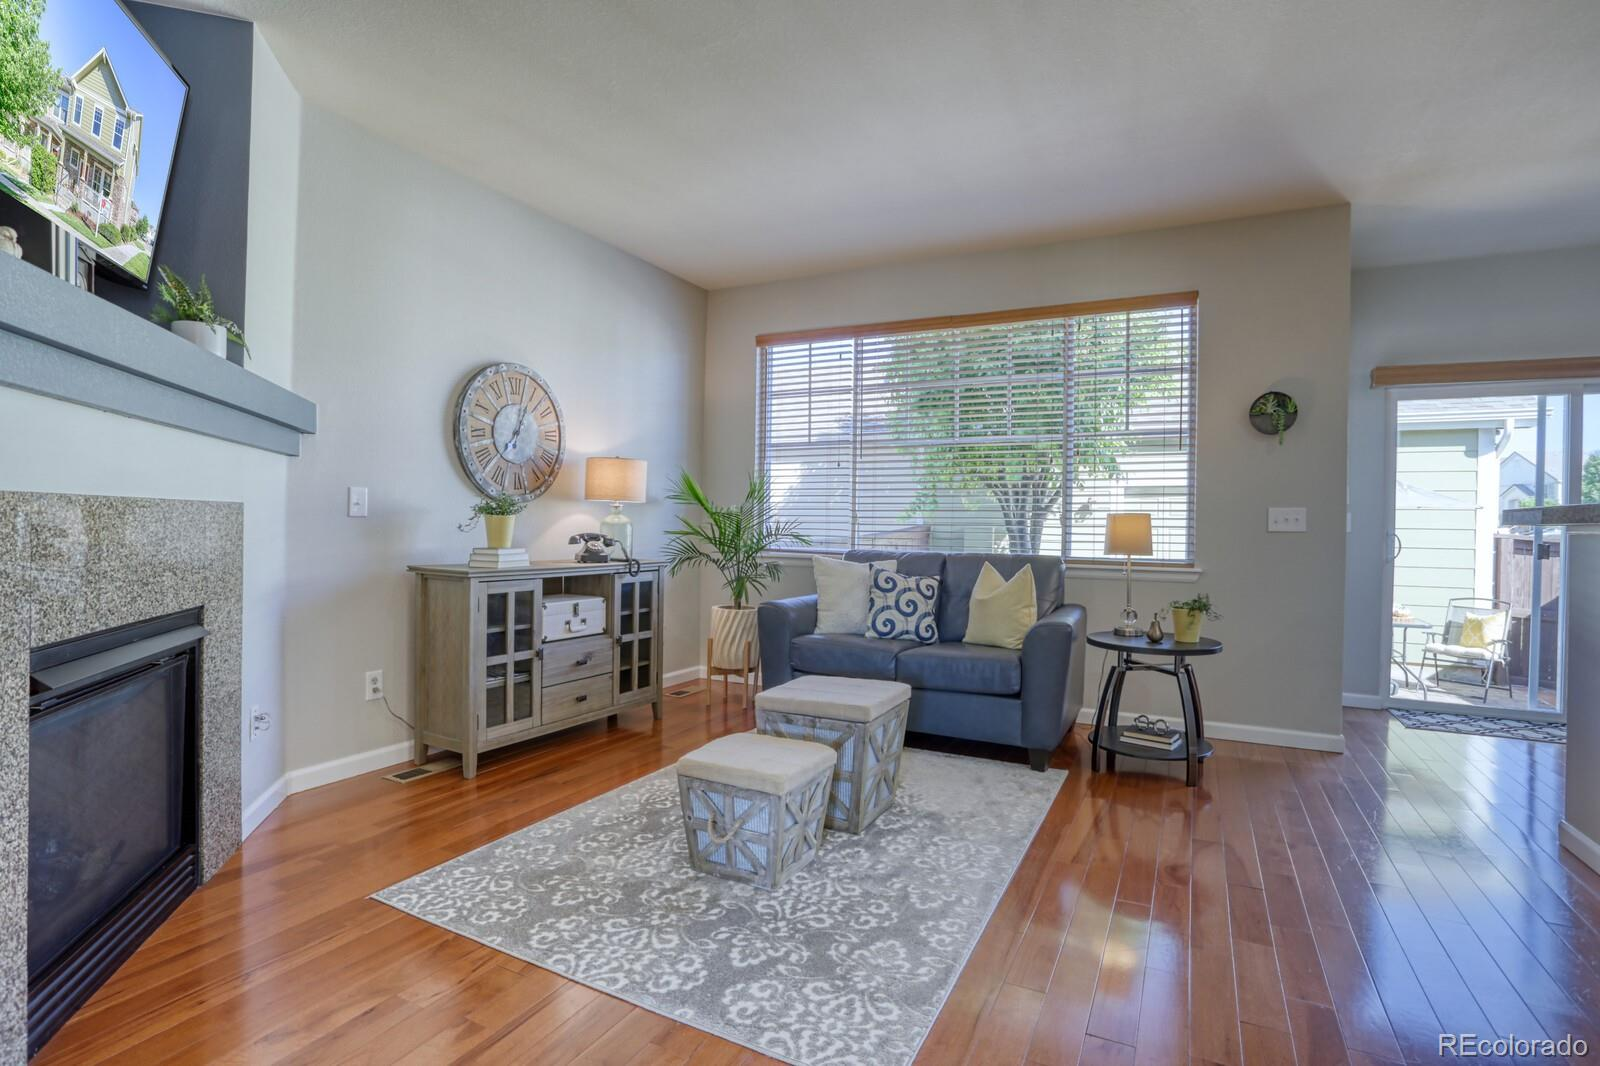 MLS# 8551789 - 9 - 22752 E Briarwood Place, Aurora, CO 80016